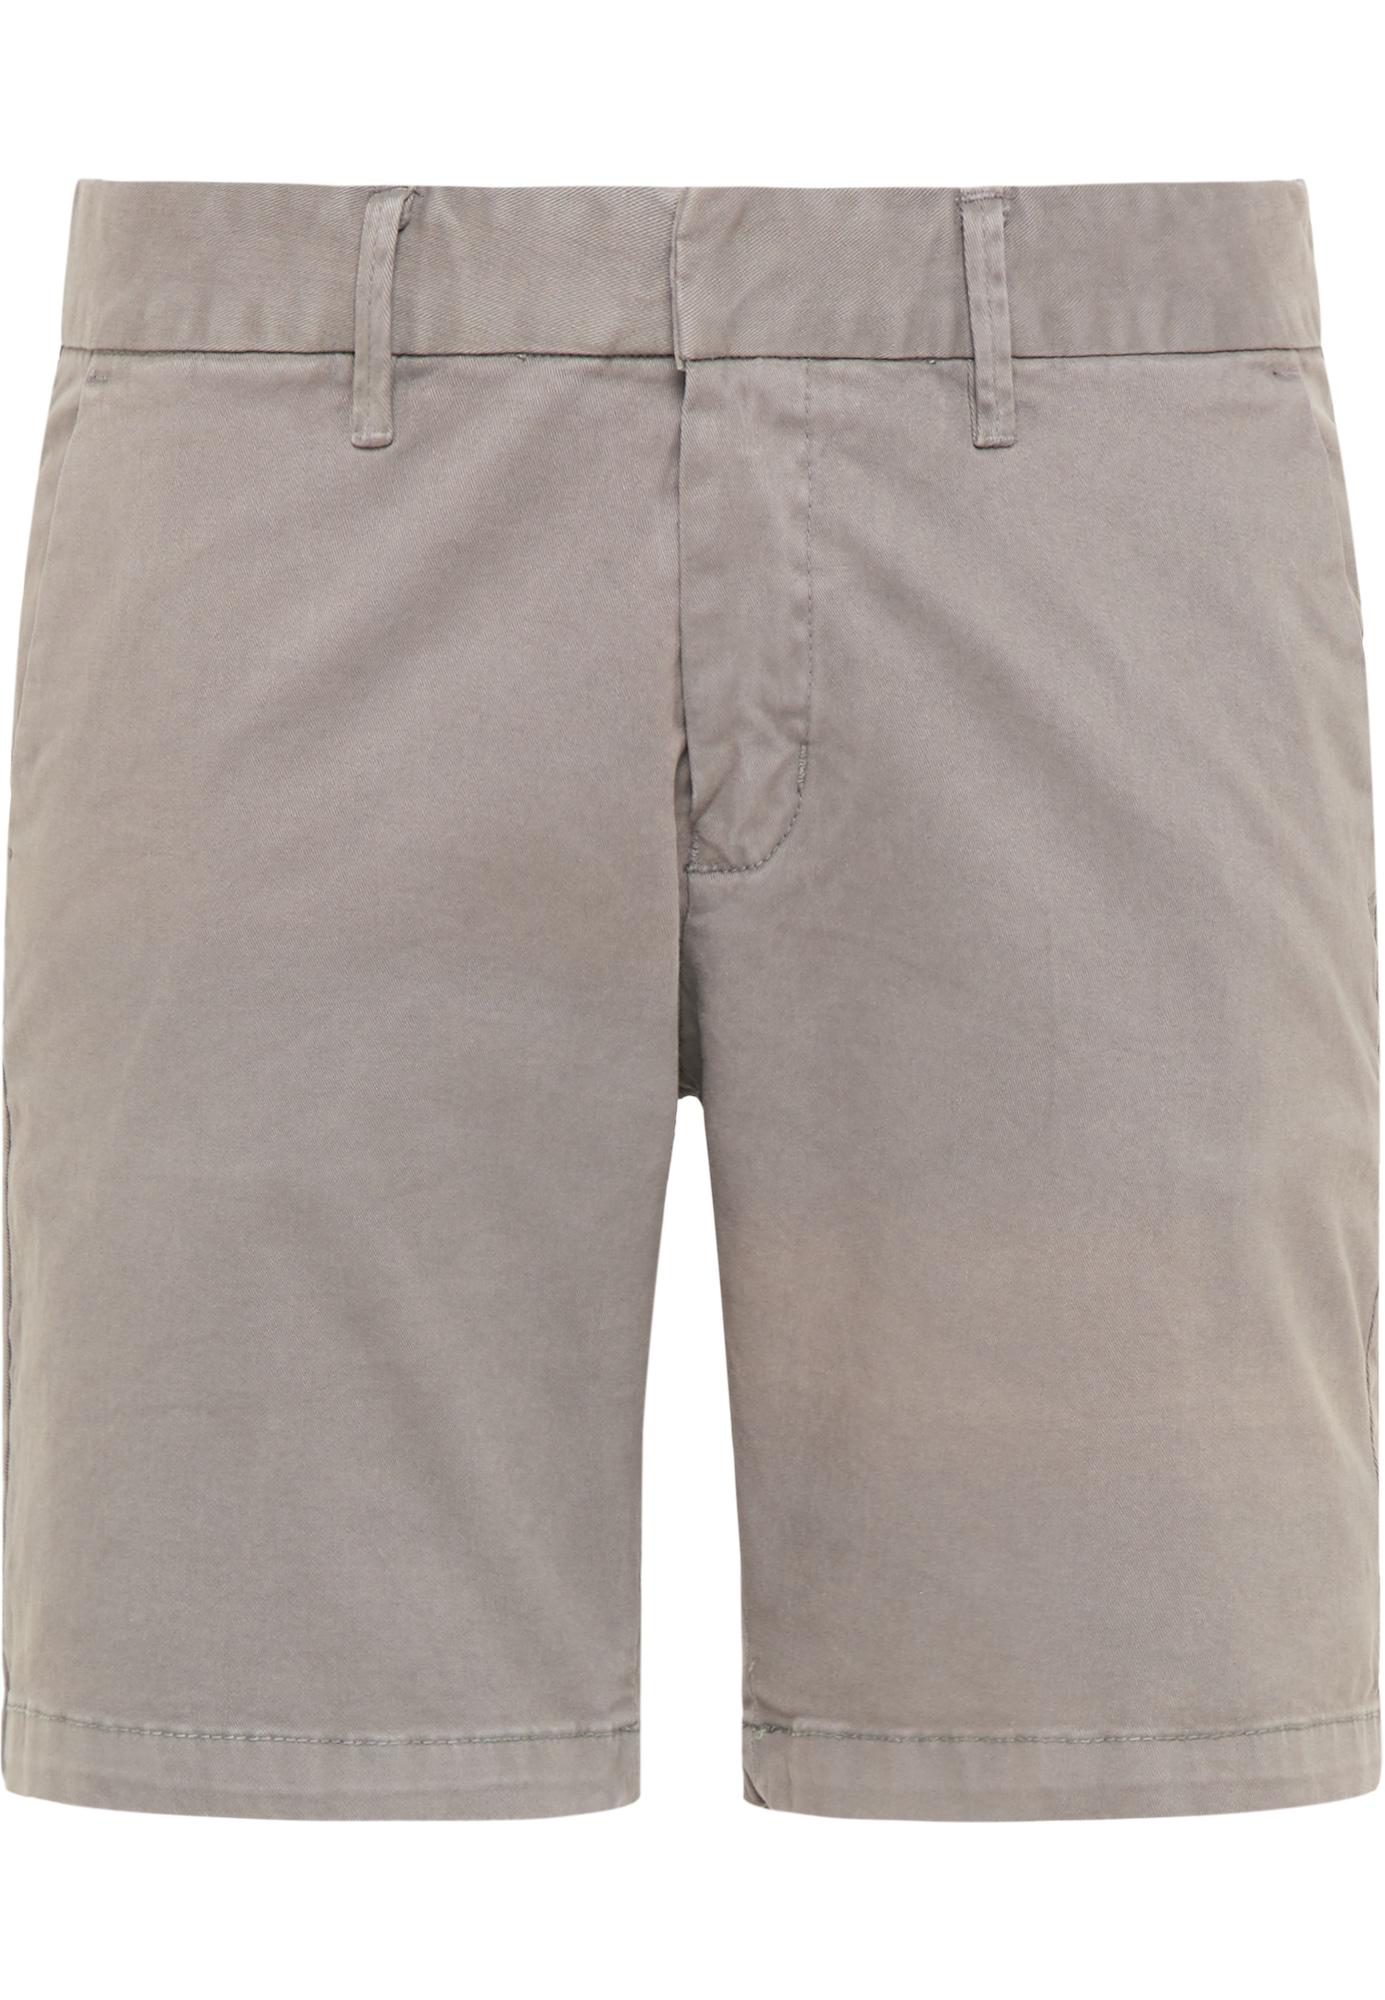 DreiMaster Vintage Kelnės rausvai pilka